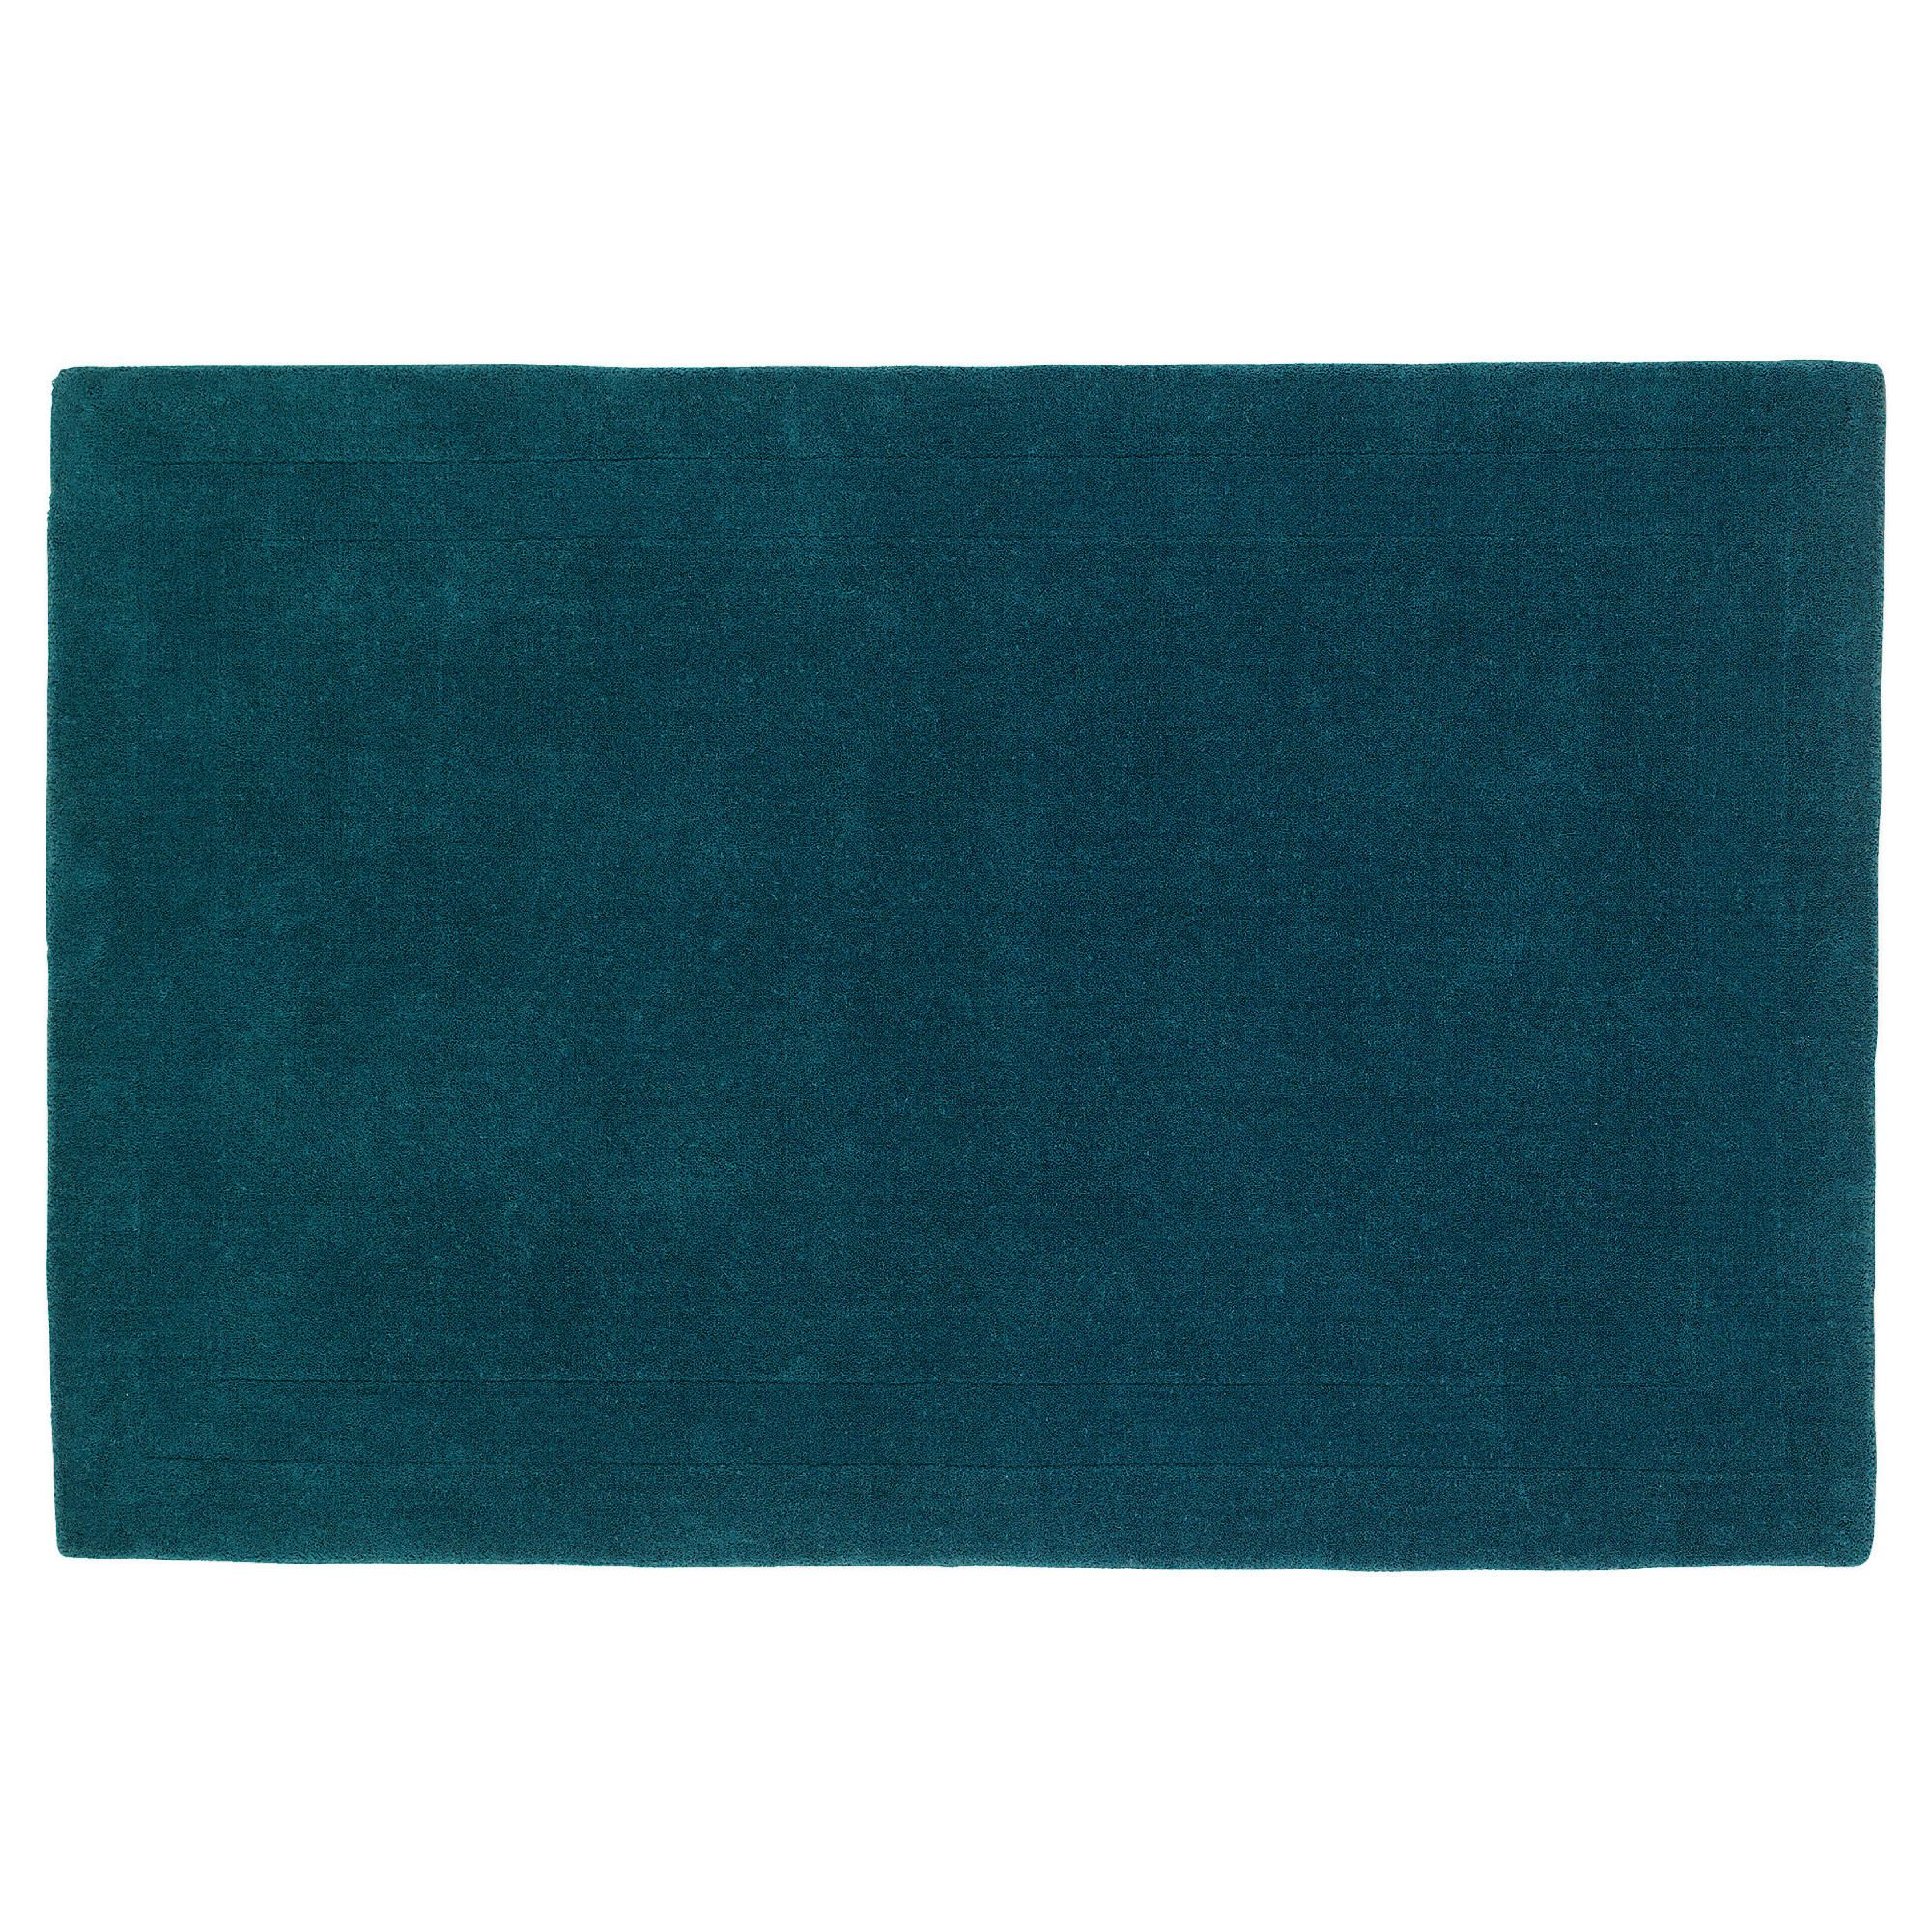 Tesco Rugs Plain Wool Rug Teal 160x230cm